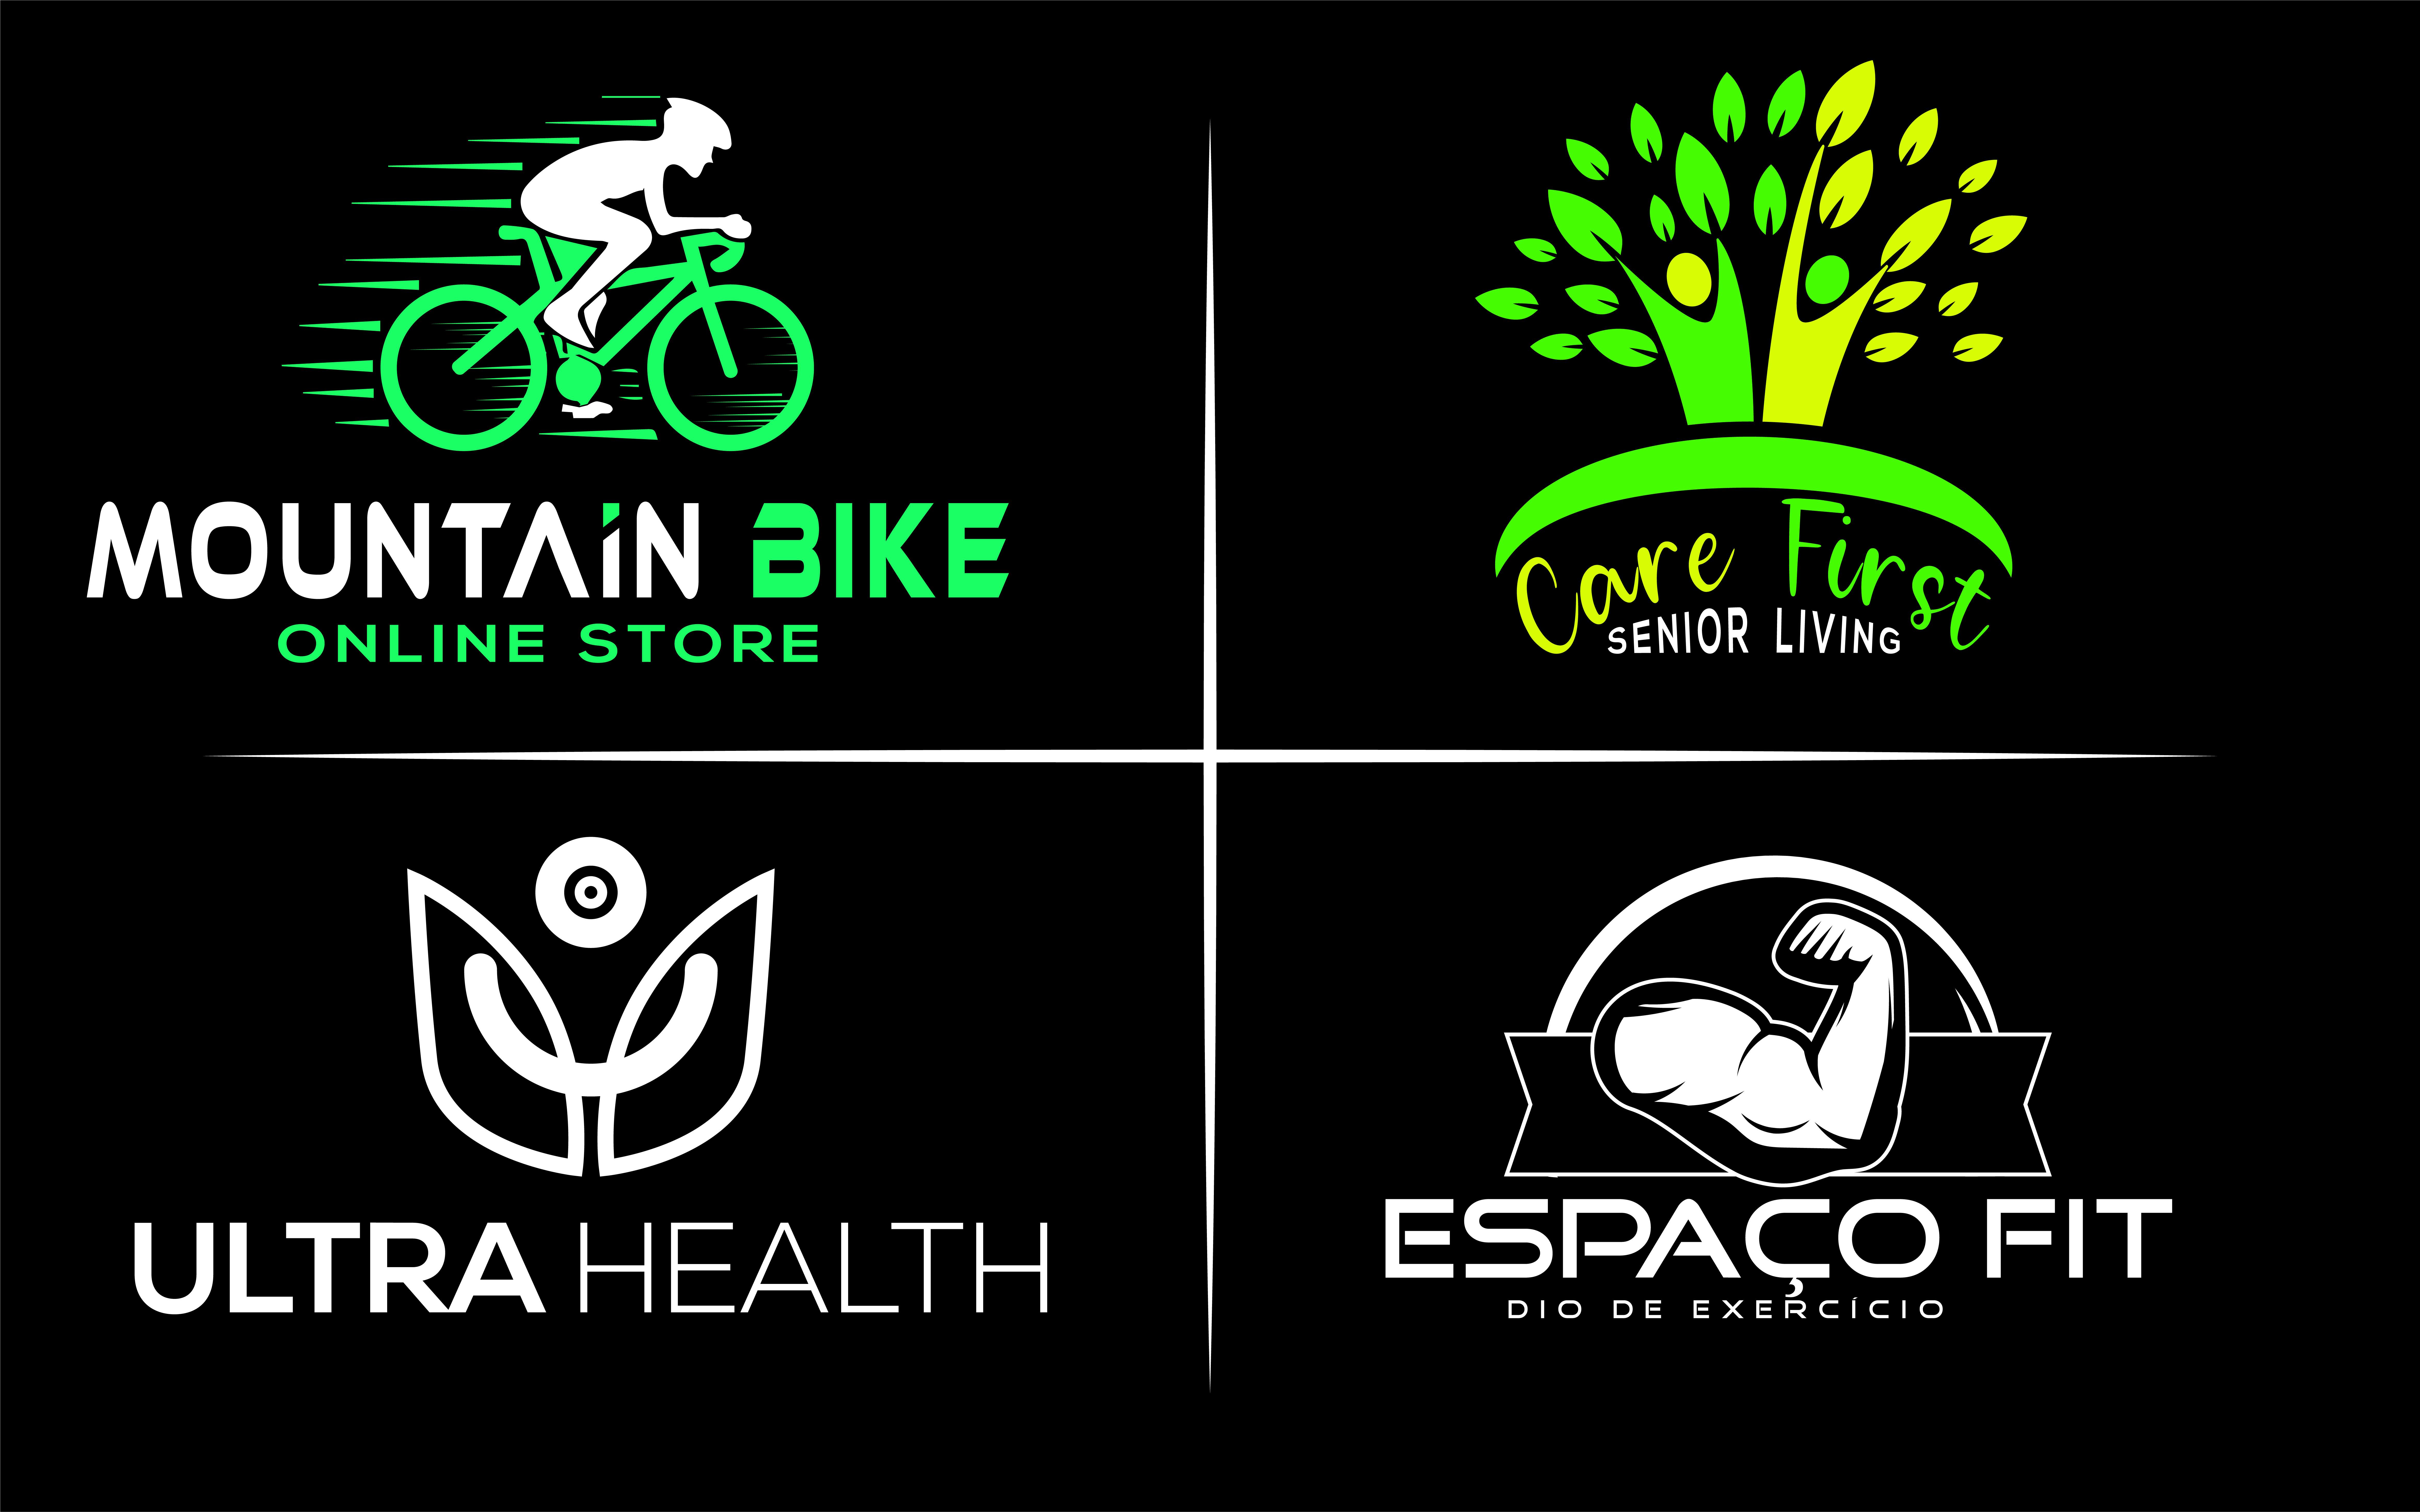 I will design creative modern minimalist business logo